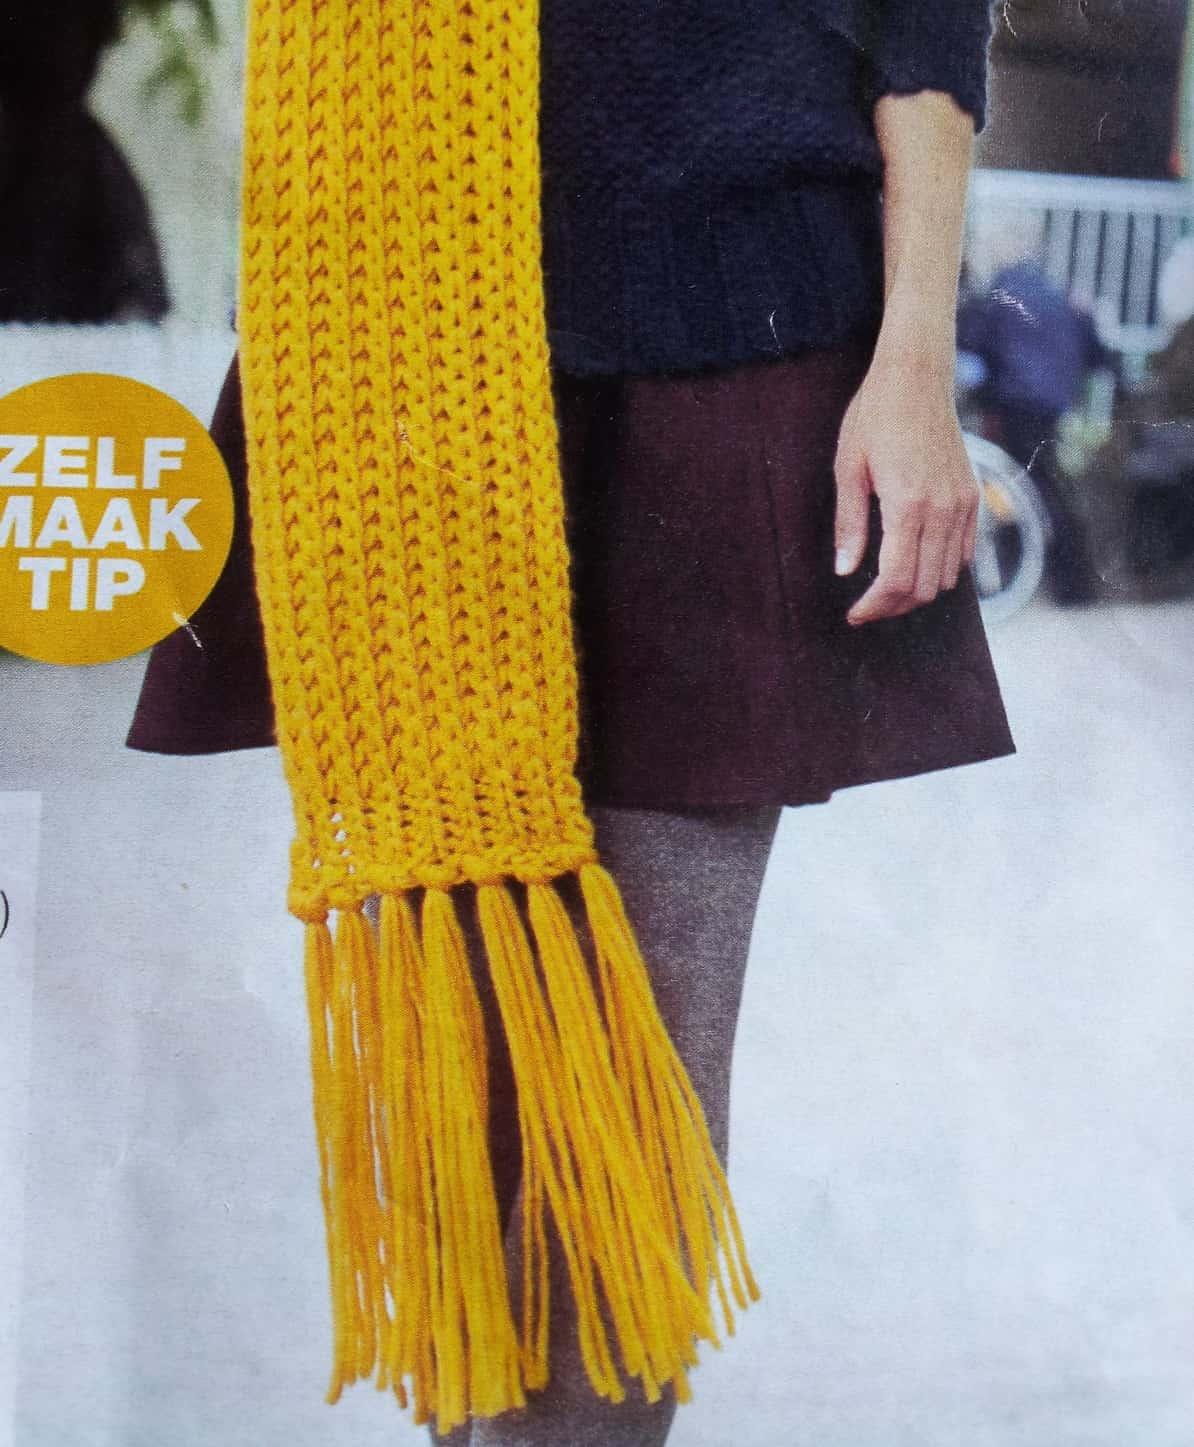 Sjaal breien hoeveel steken